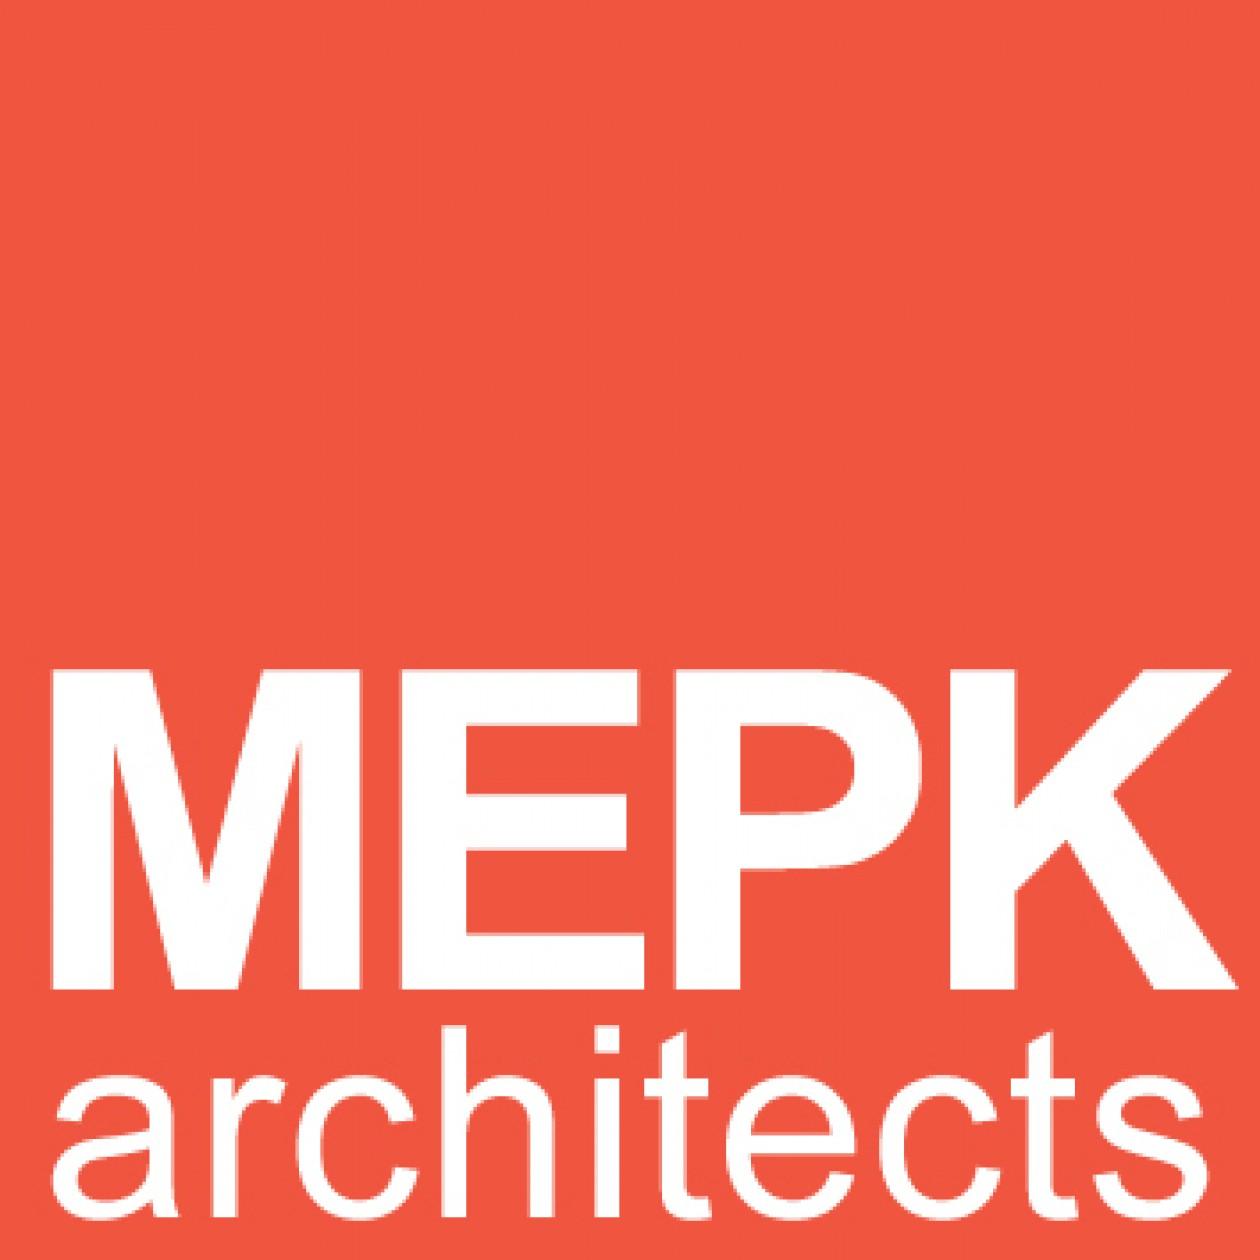 MEPK Architects